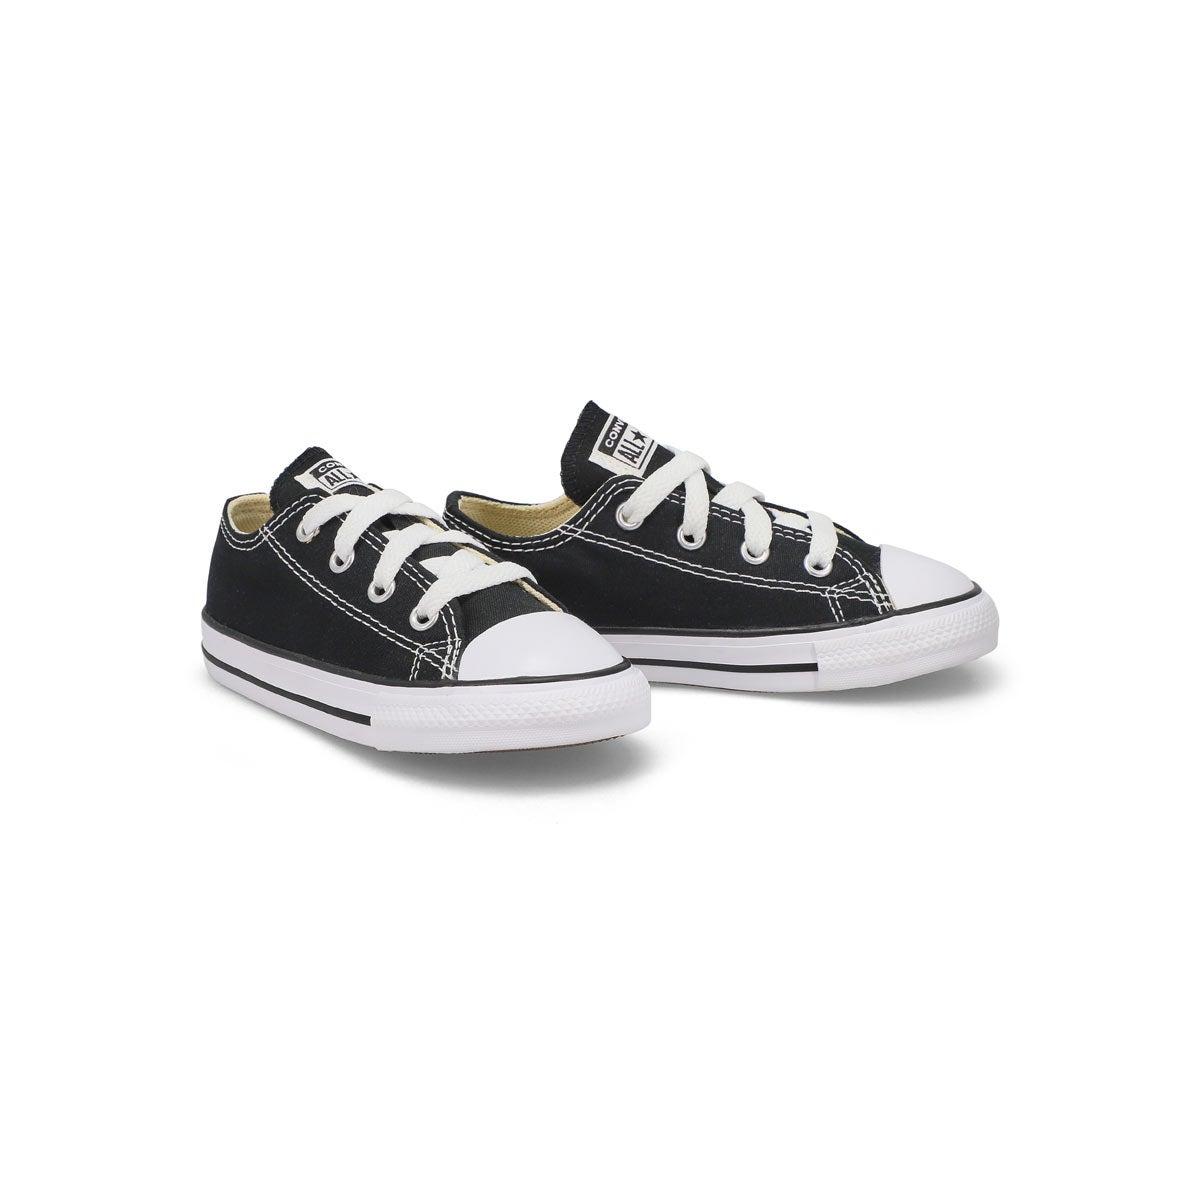 Infs CTAS Core black sneaker